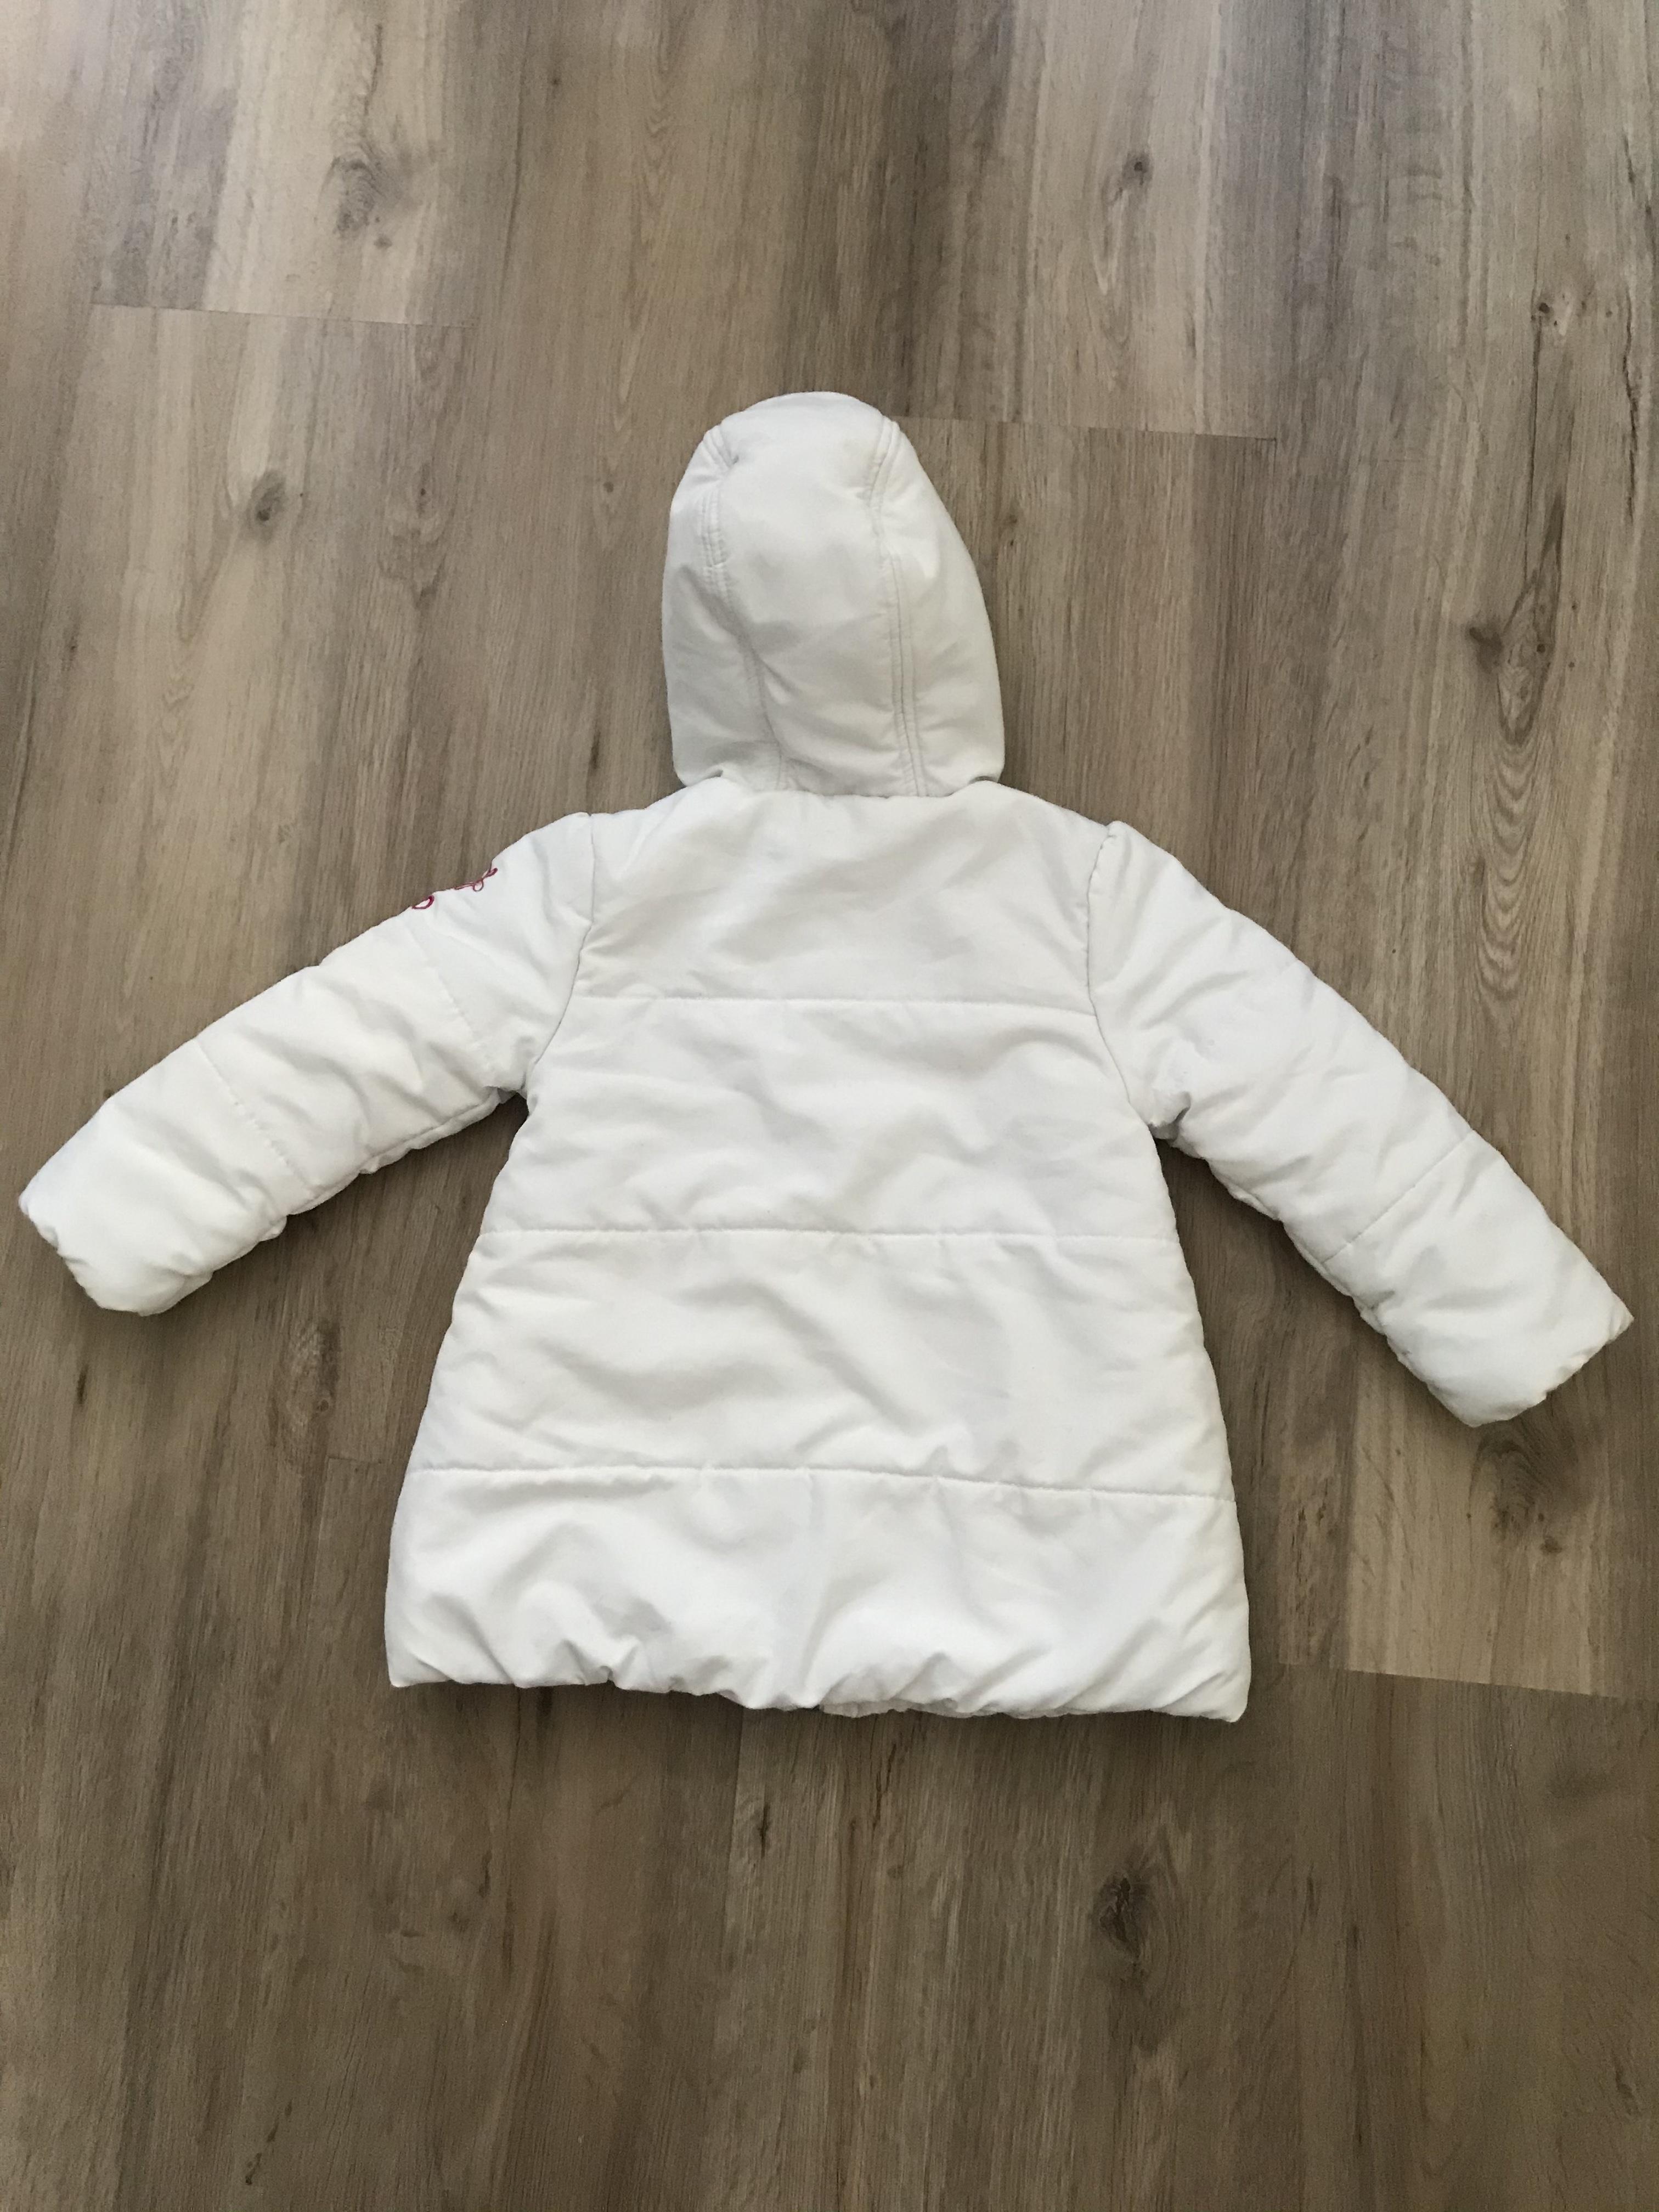 Süße weiße Frühjahrsjacke Gr. 92 kostenlos